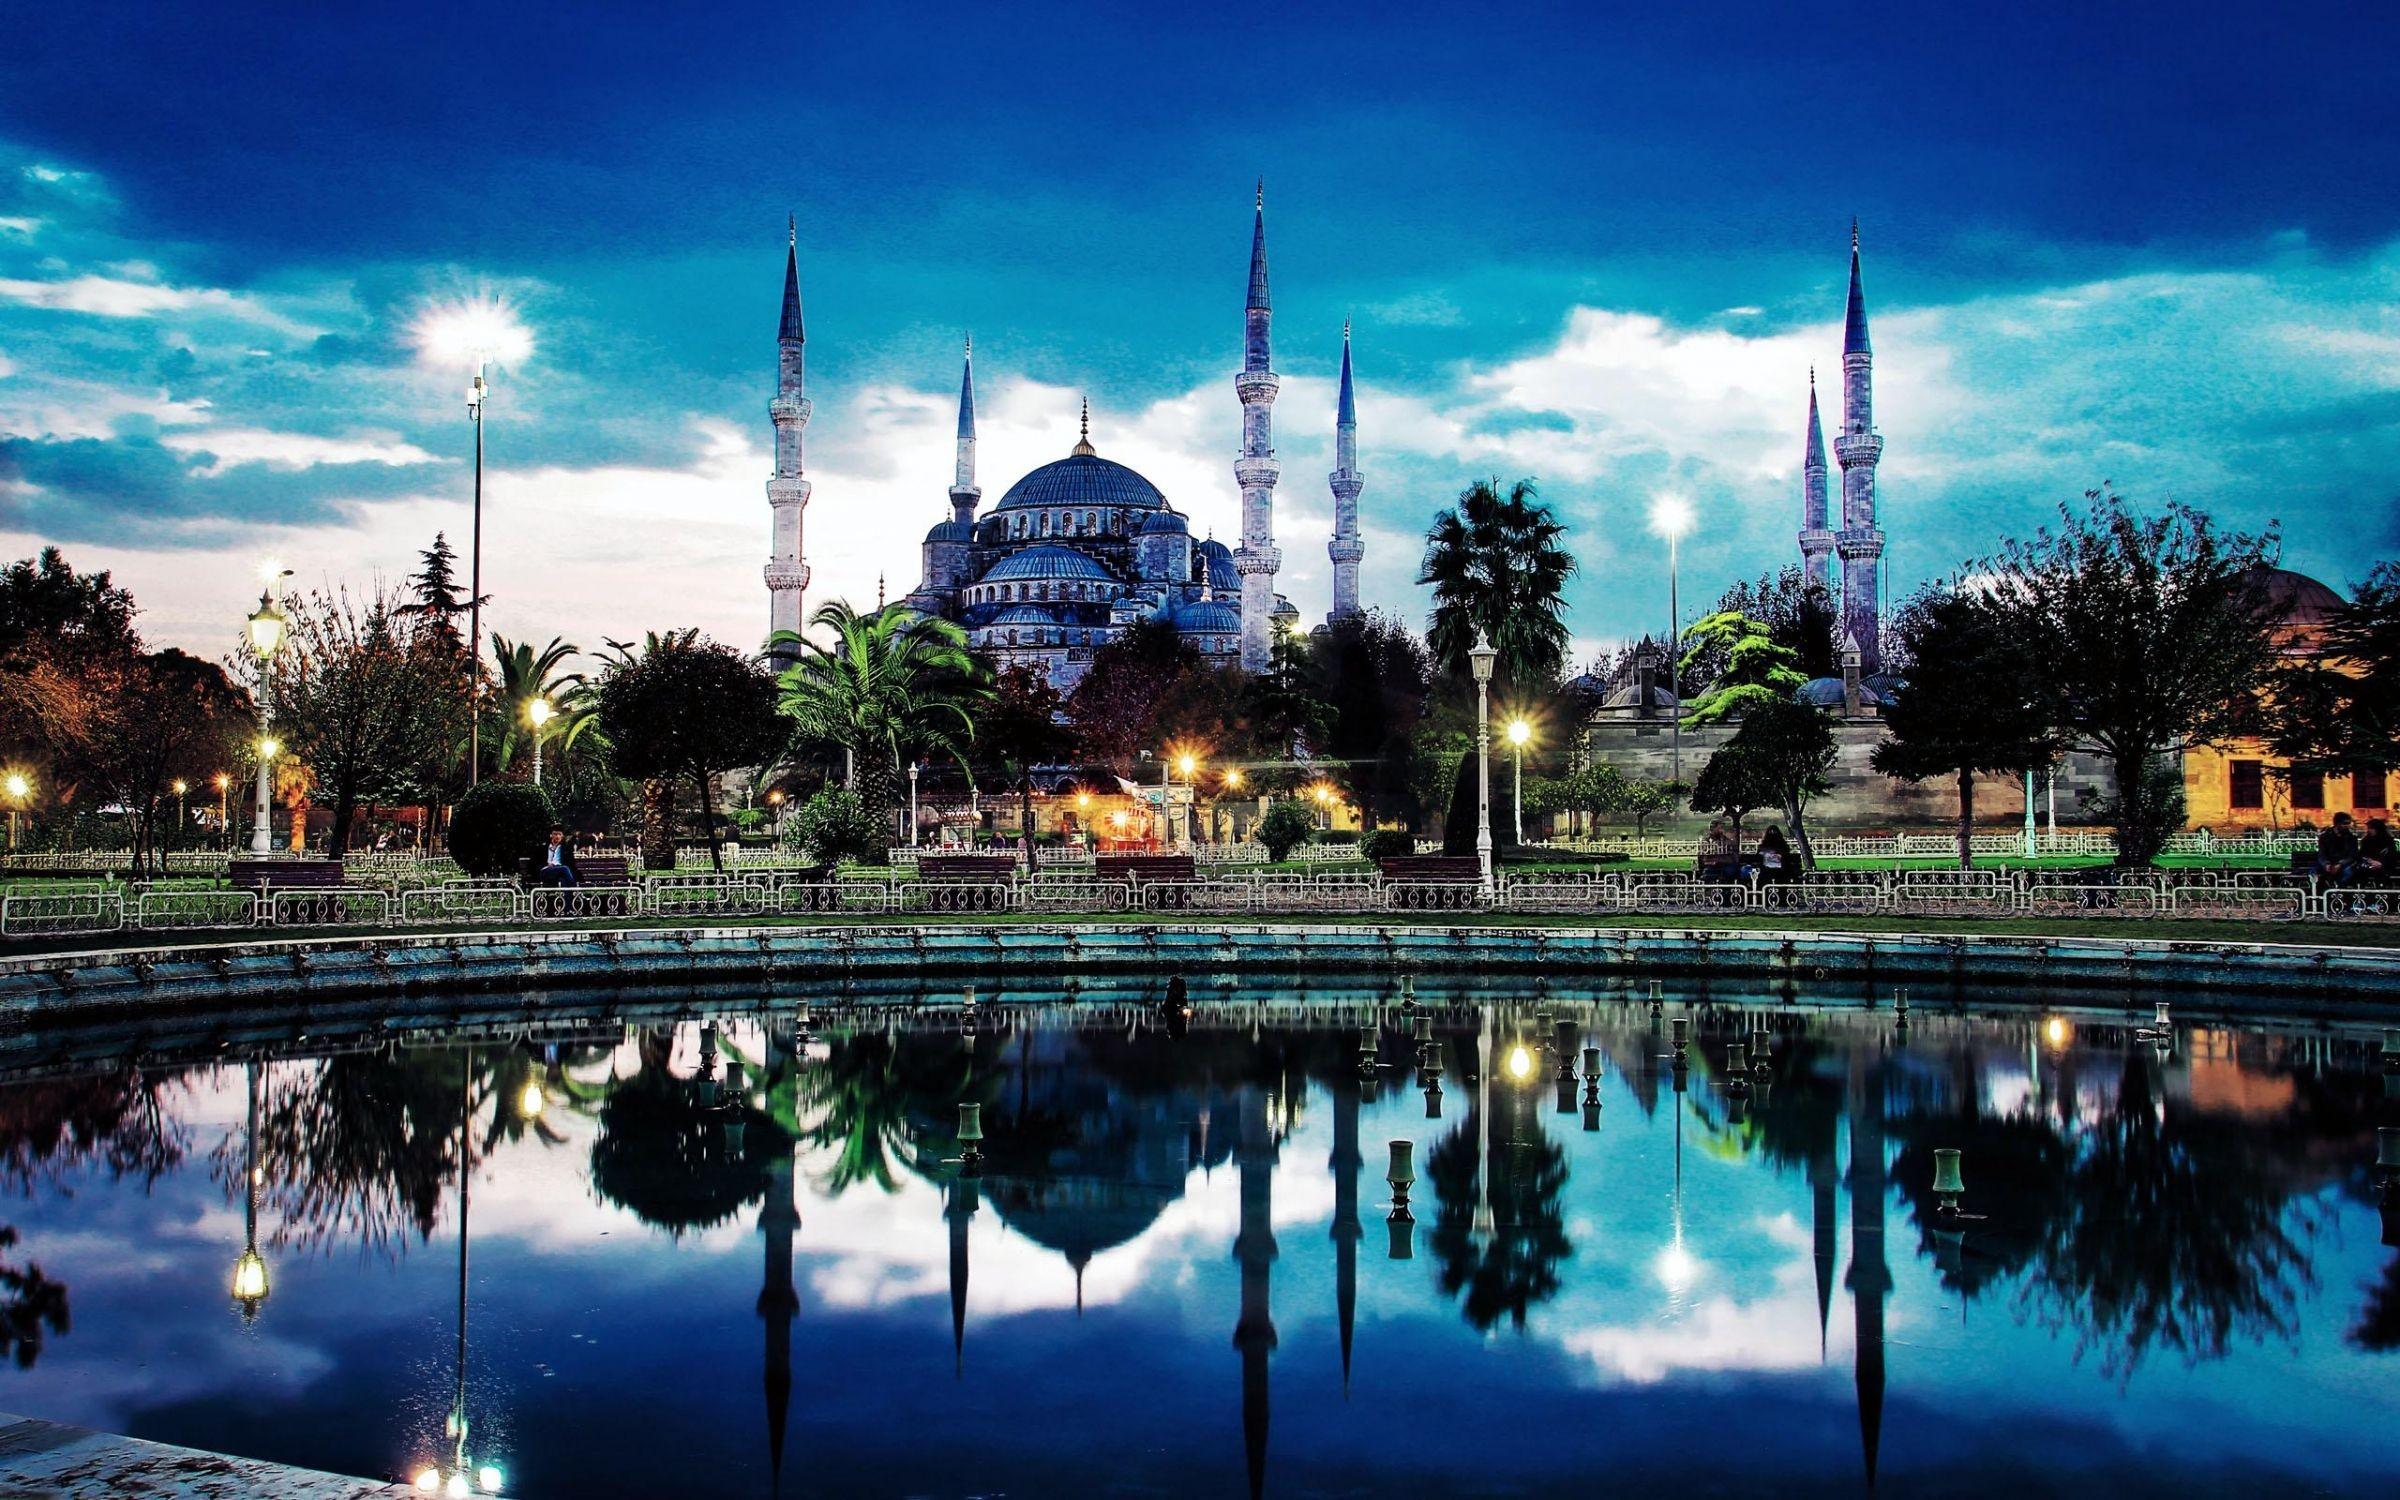 7af7dec69c Κωνσταντινούπολη - Χρώματα   αρώματα Αγ.πνεύμα - GrecosTravel